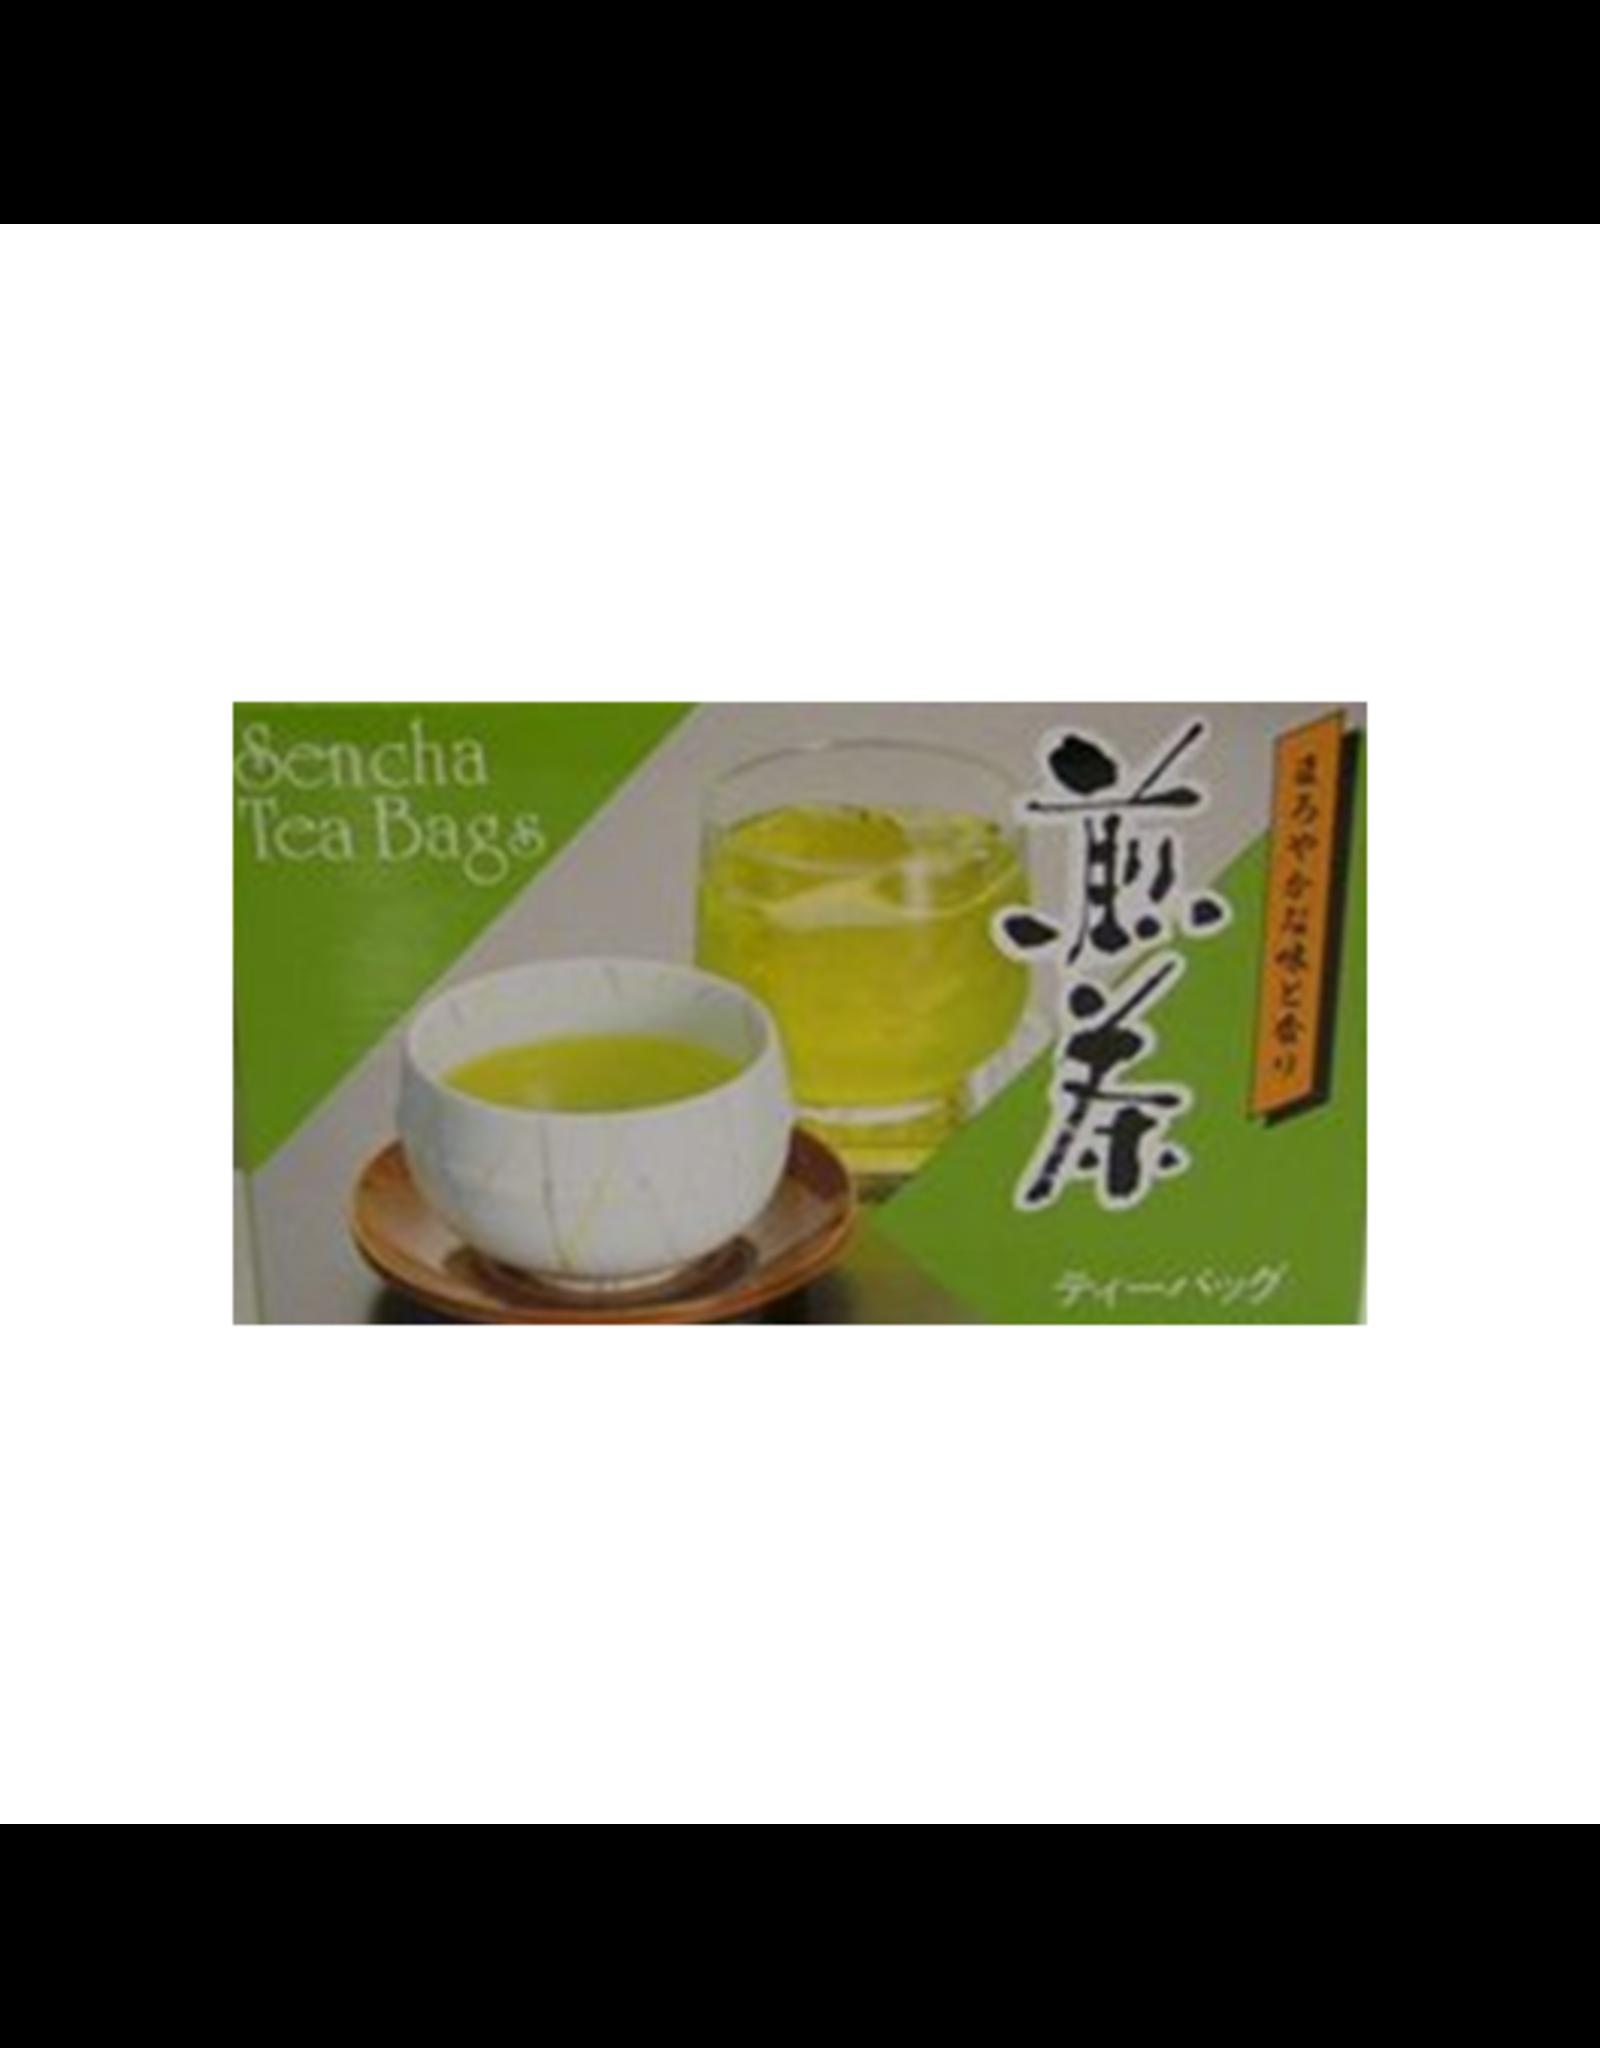 Hamasa Yuki Genmai Cha Tea Bags